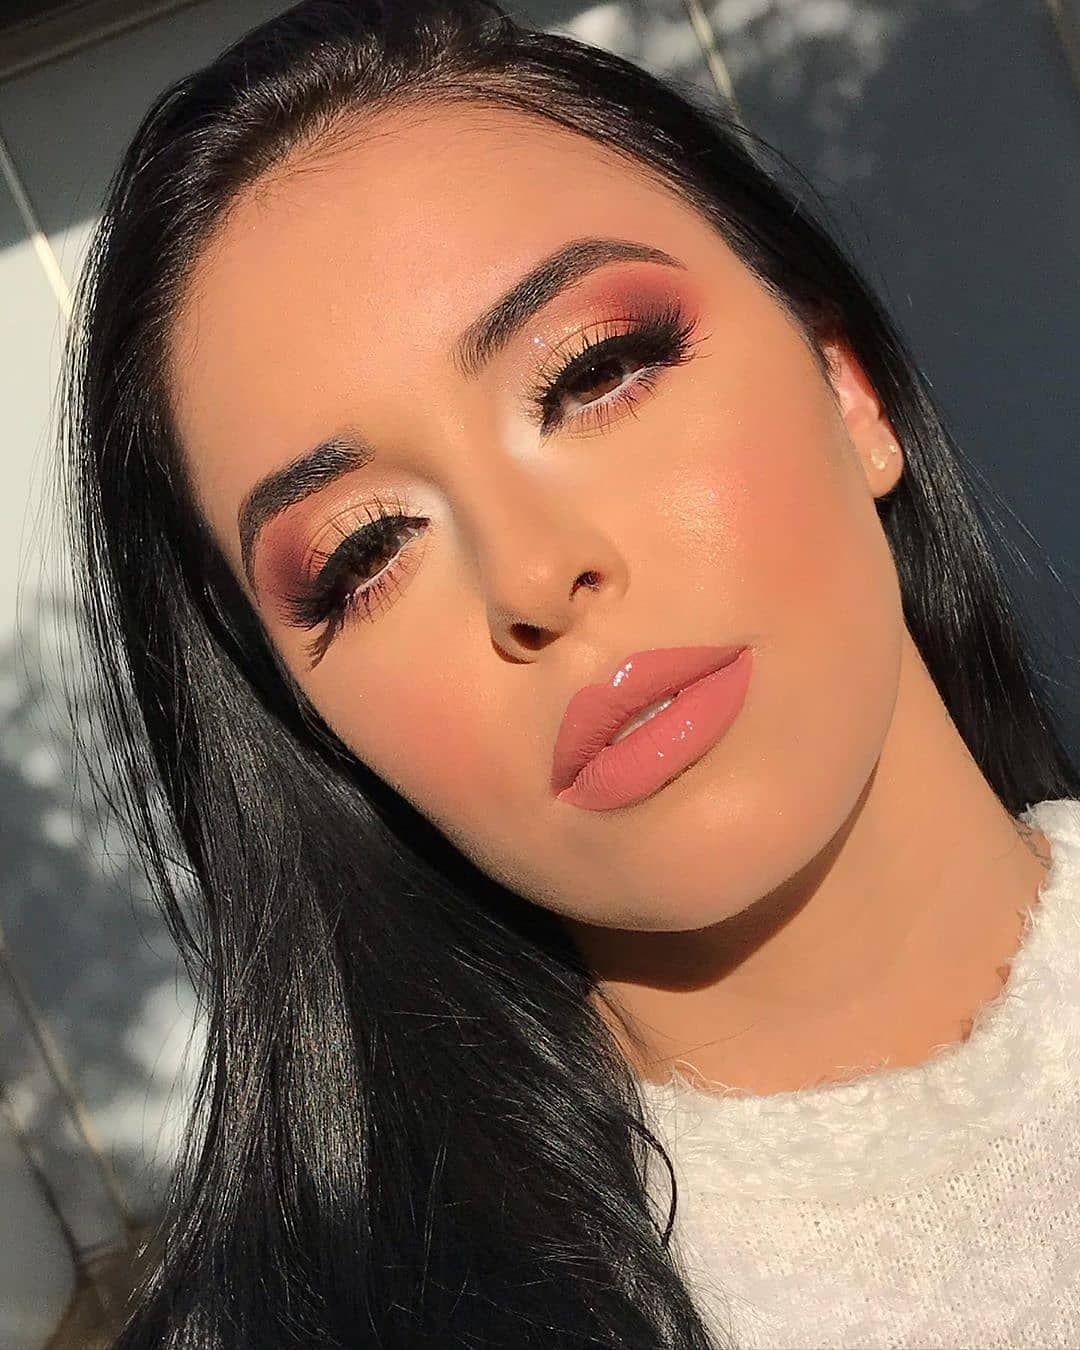 natural makeup in 2020 Glam makeup, Makeup obsession